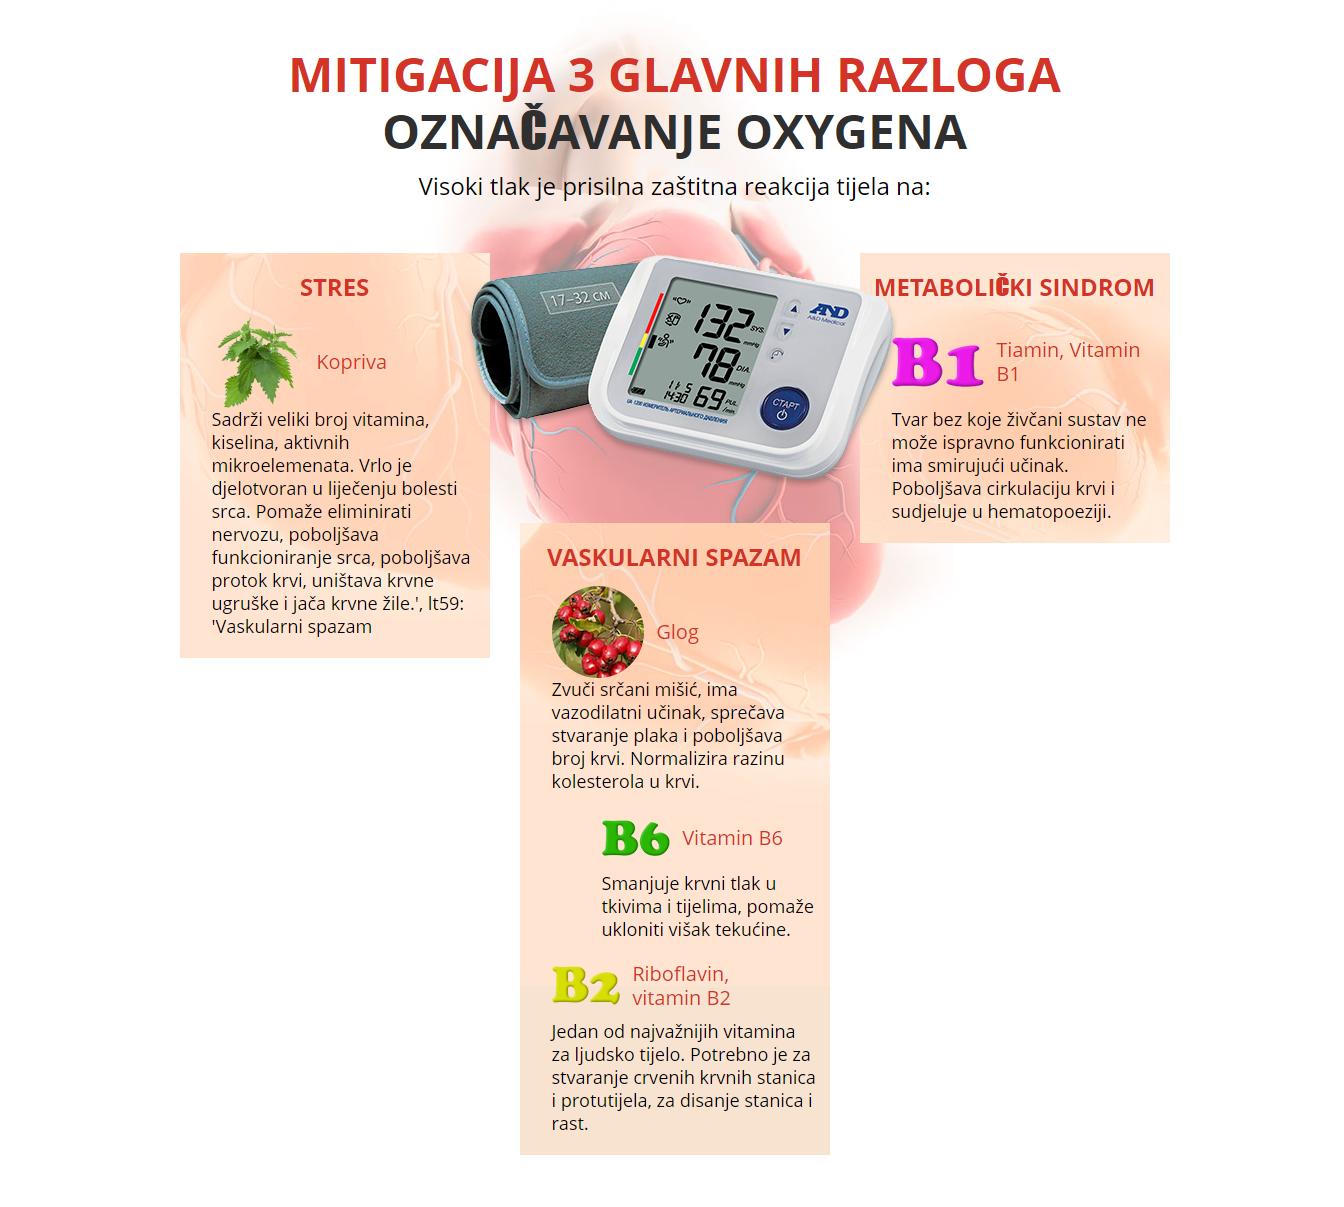 hipertenzija u spazmi krvnih žila)